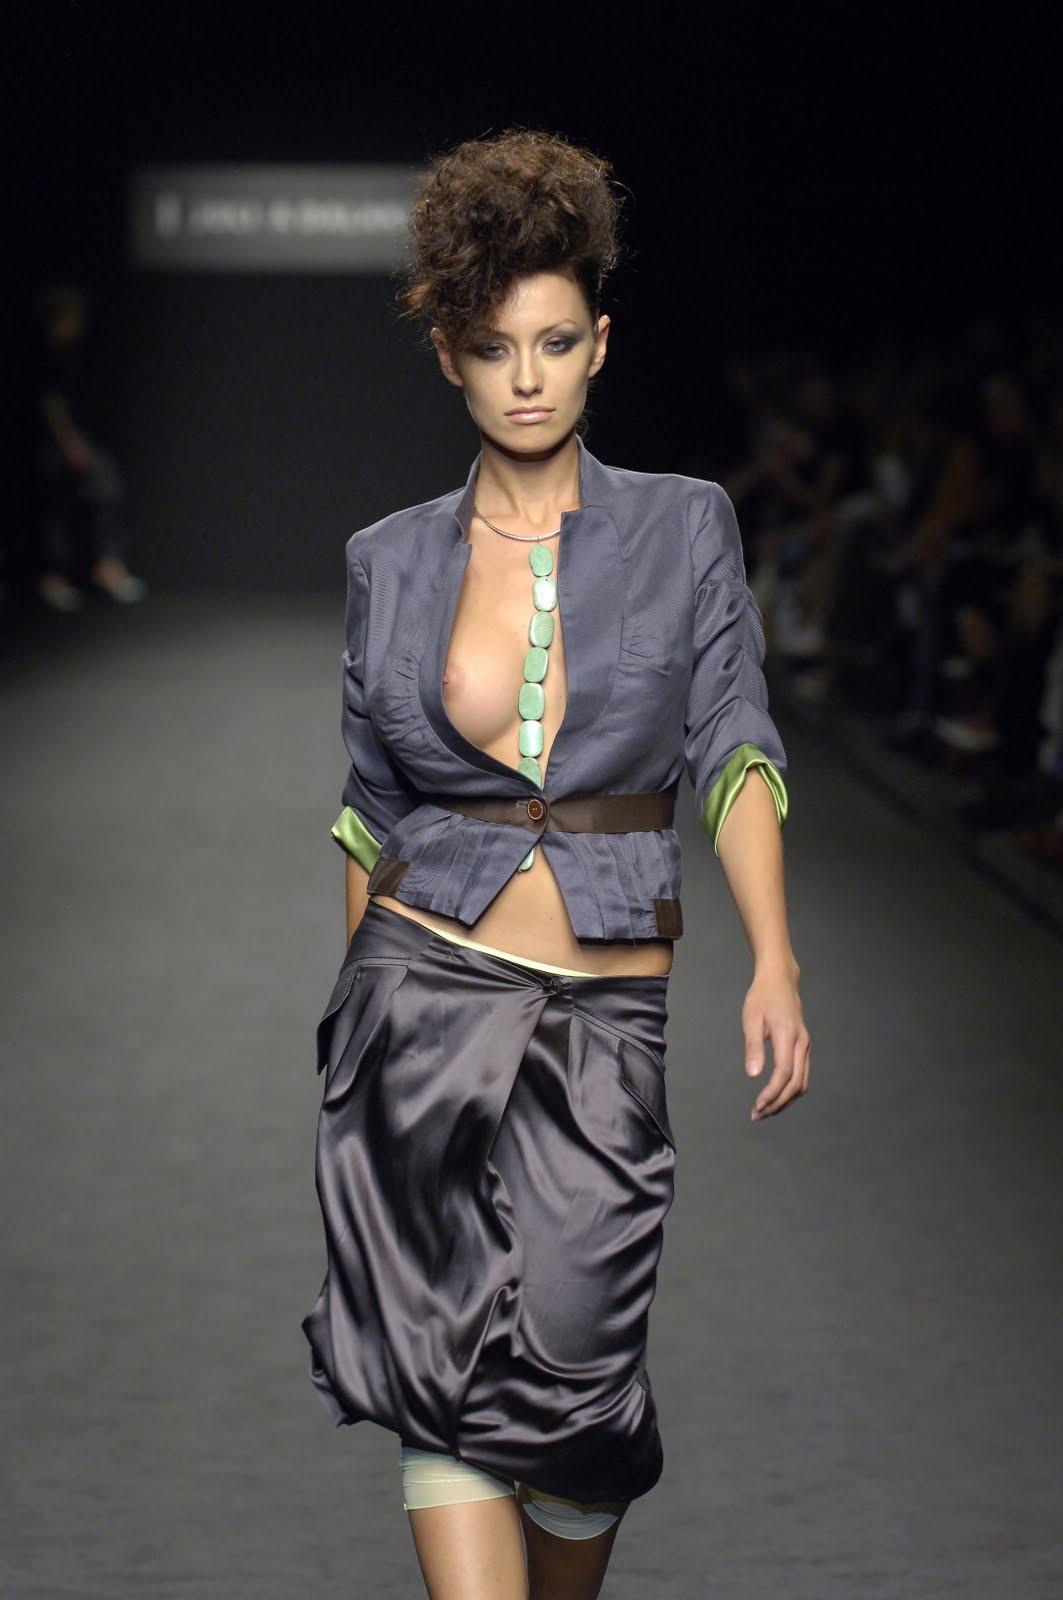 Nude Model Catwalk 14